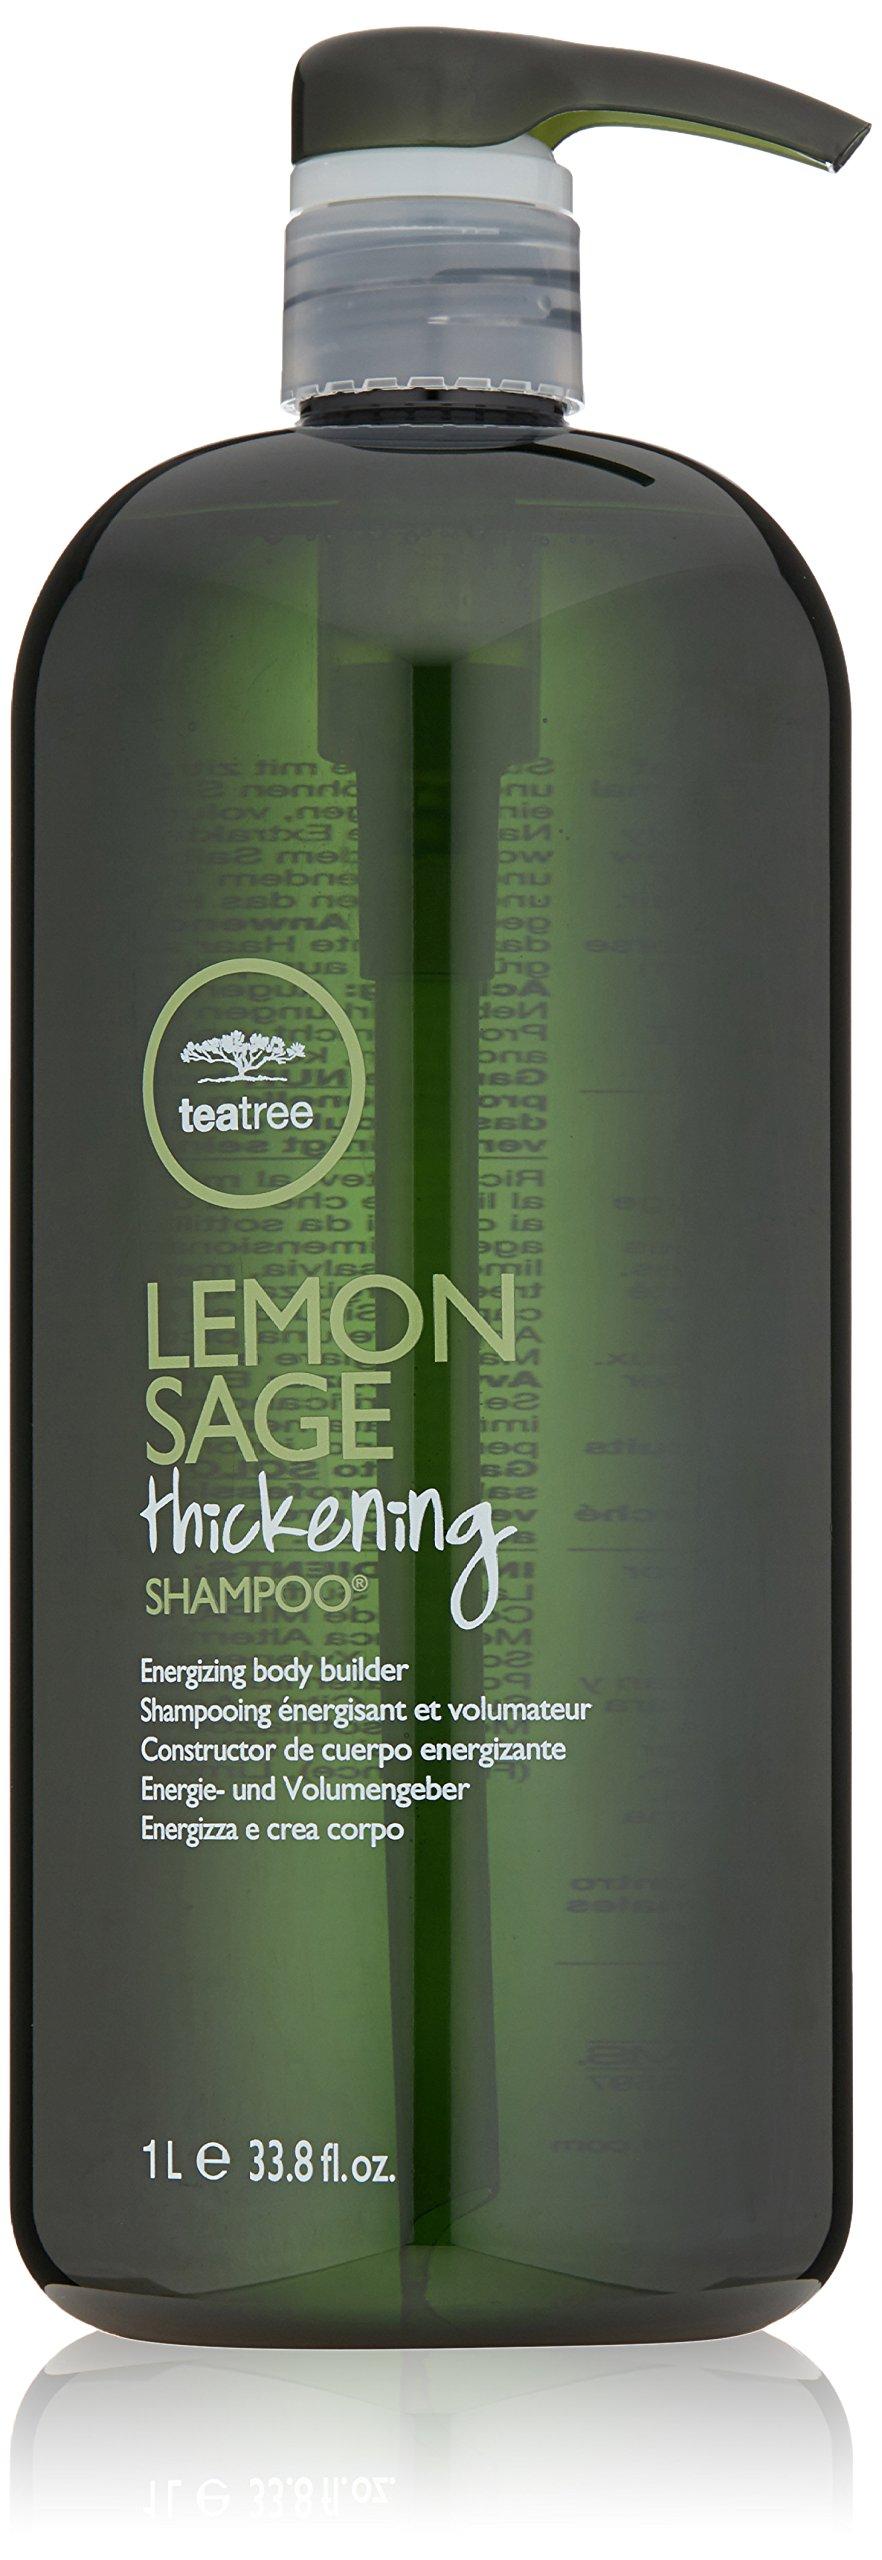 Tea Tree Lemon Sage Thickening Shampoo, 33.8 Fl Oz by Tea Tree